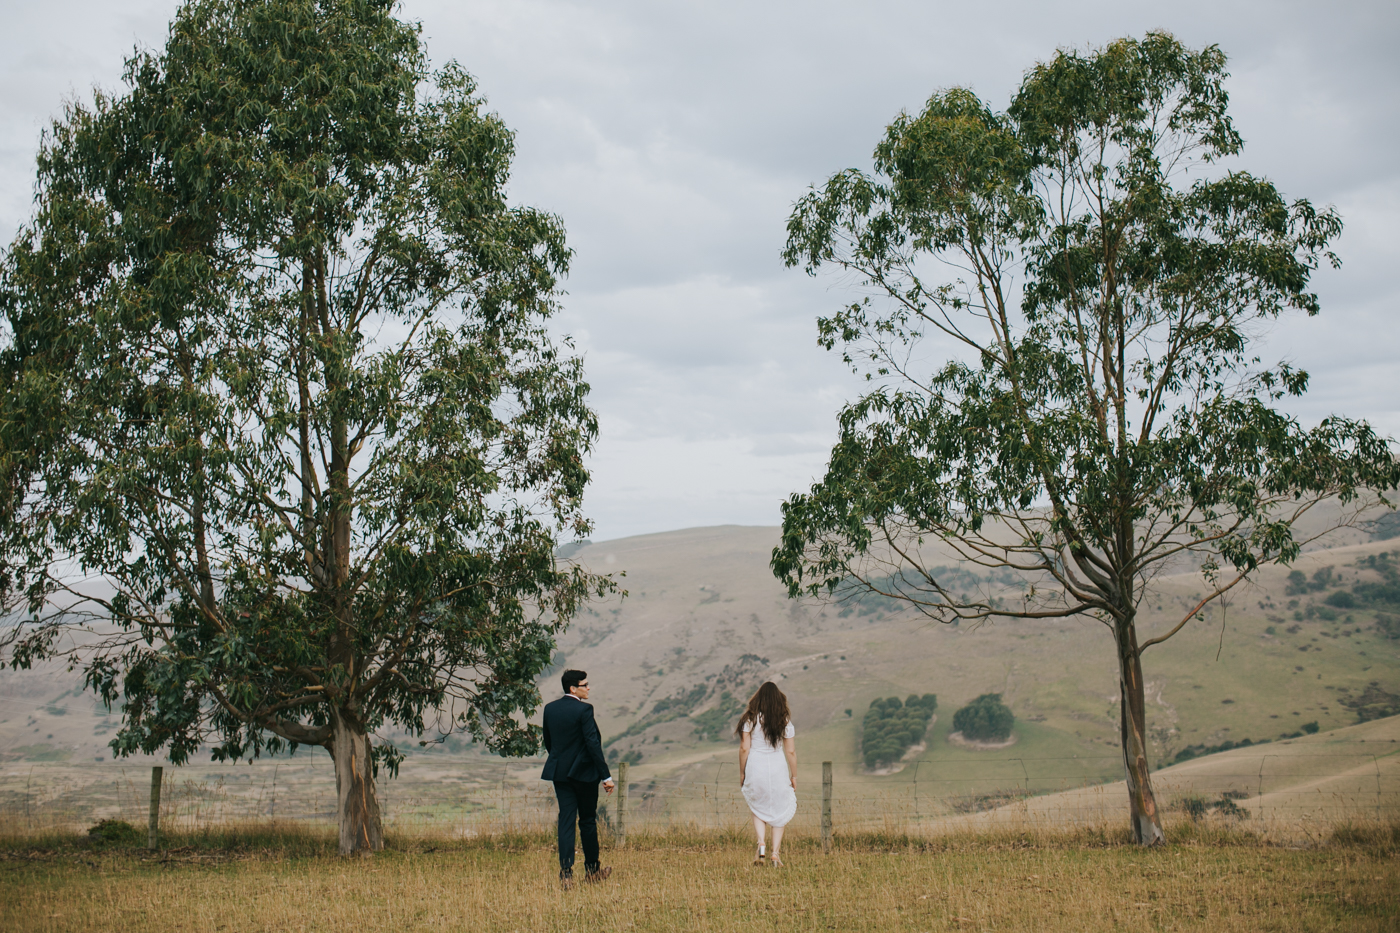 Ariana & Tim - Dunedin, New Zealand Wedding - Destination Wedding - Samantha Heather Photography-204.jpg